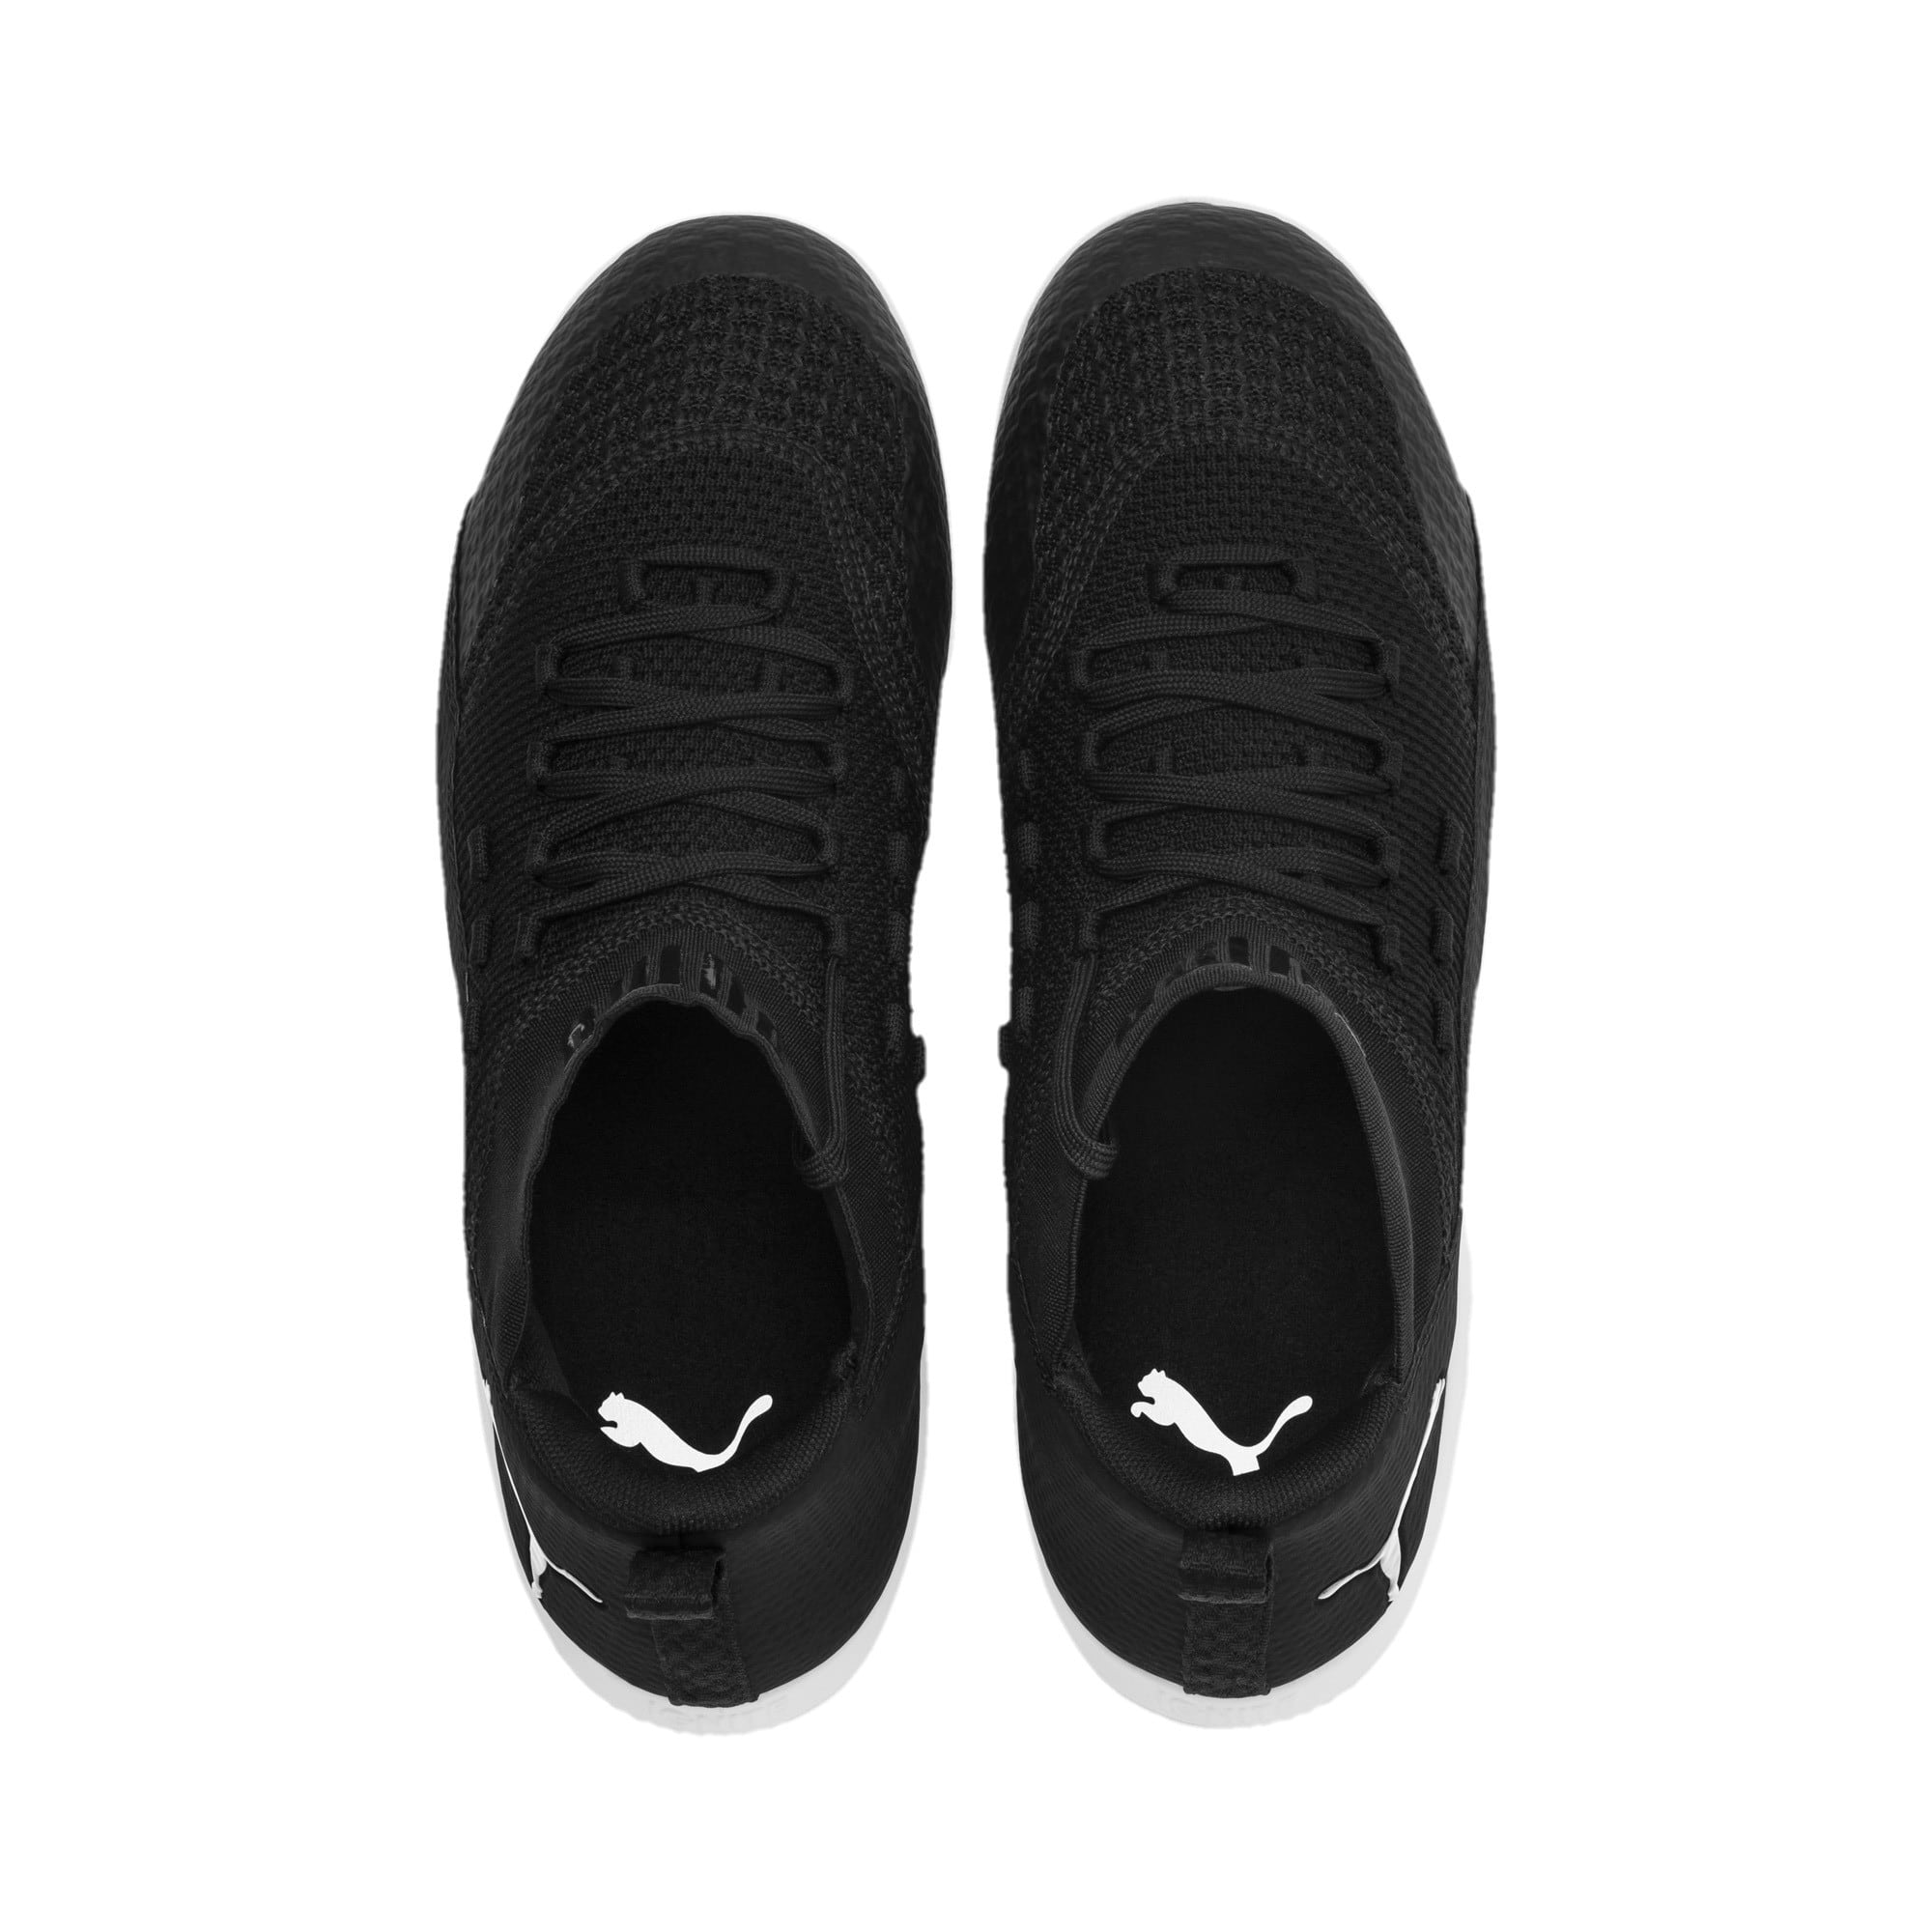 Thumbnail 6 of 365 IGNITE FUSE 2 Men's Soccer Shoes, Puma Black-Puma White, medium